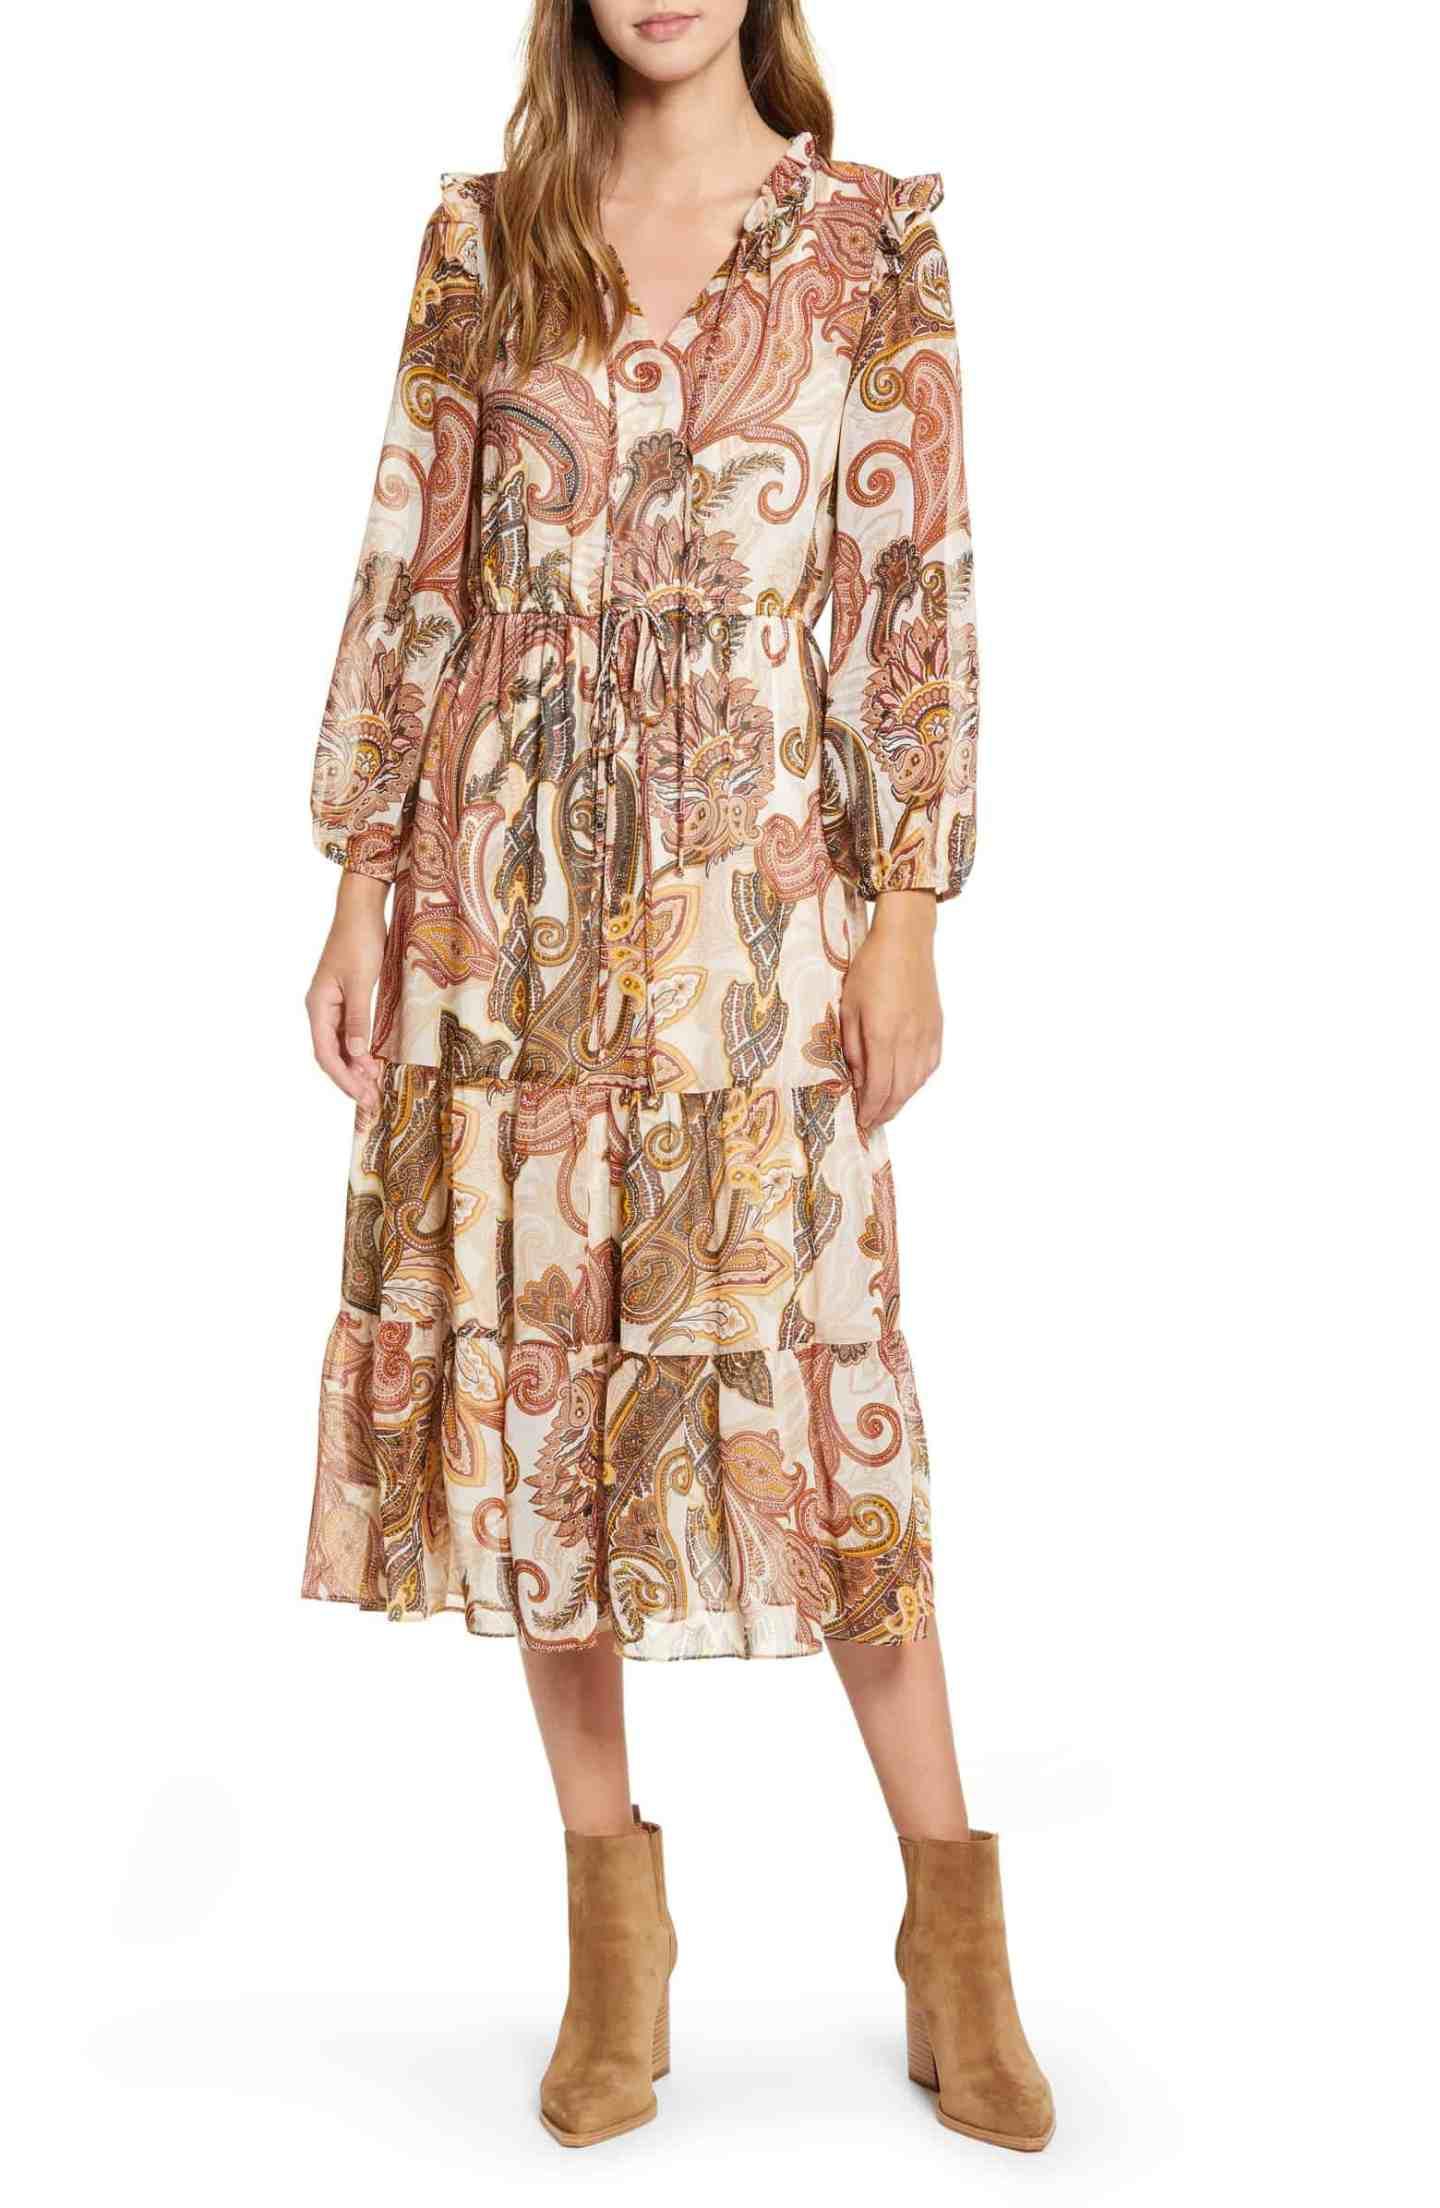 Teired-Chiffon-Midi-Dress